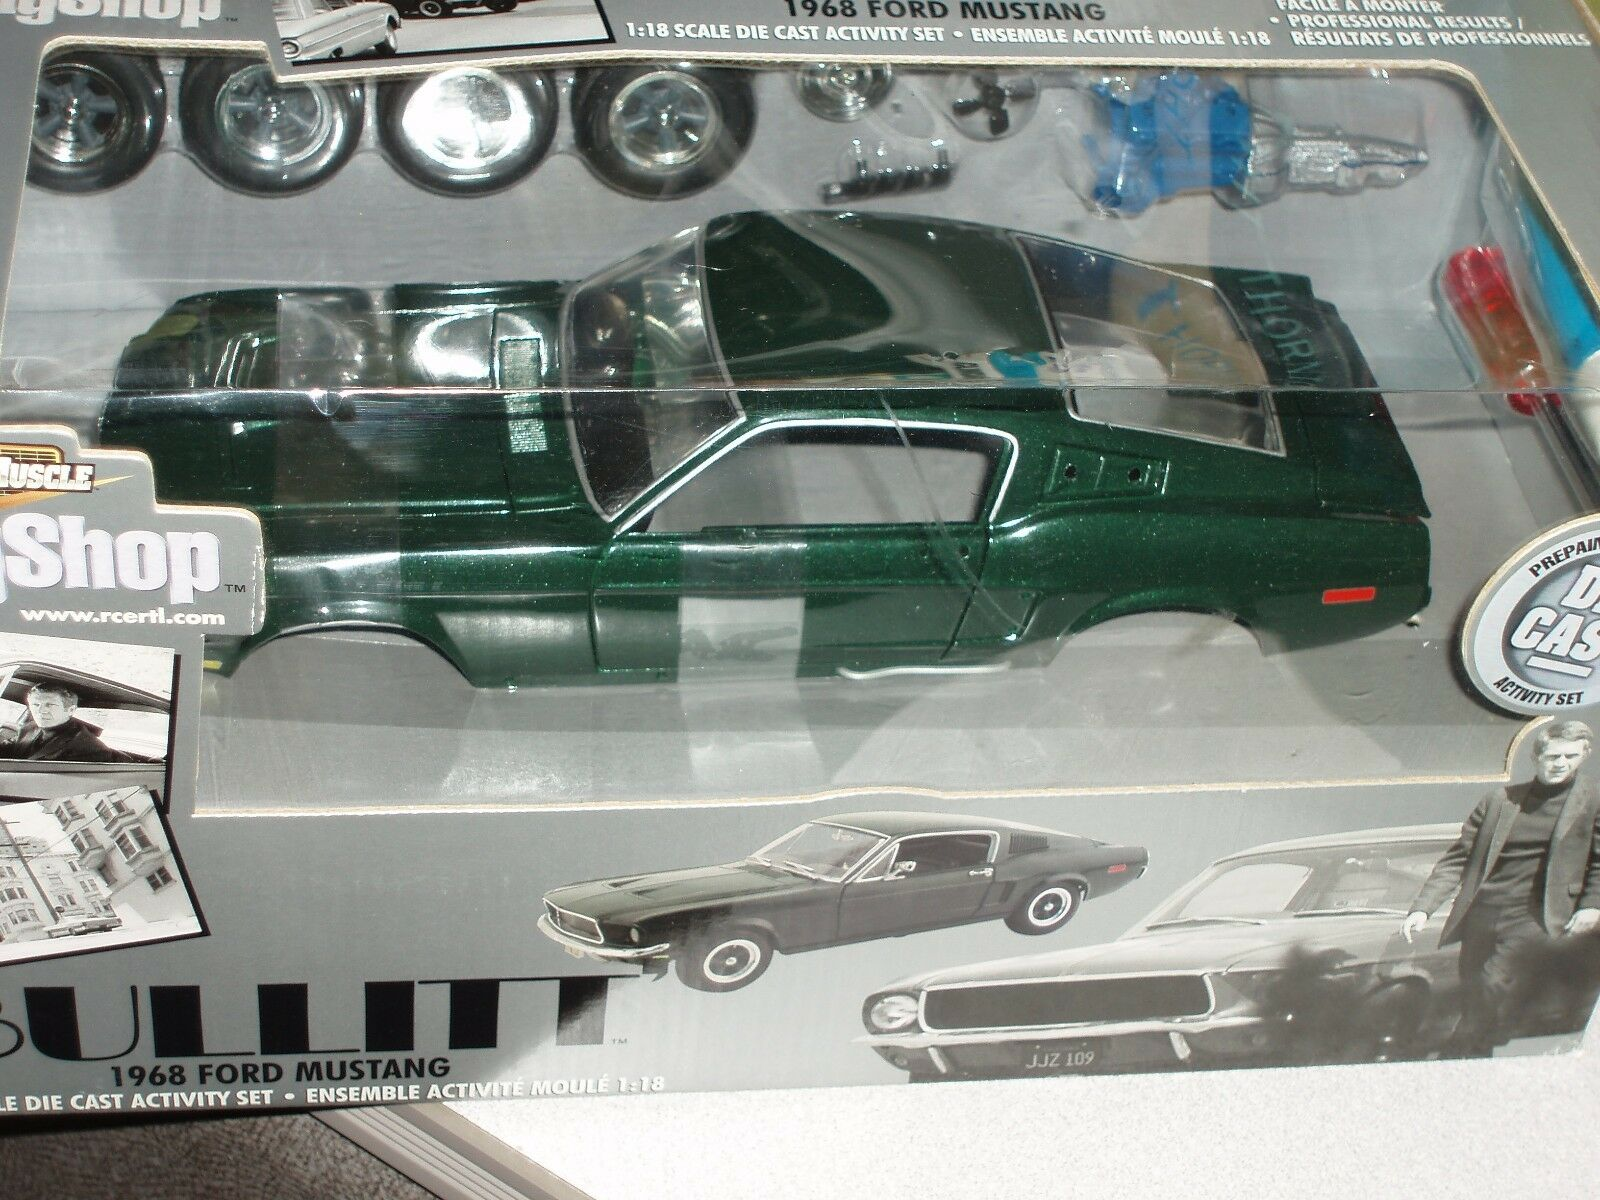 ERTL Ford Mustang 1968 Modèle GT390 Kit 1 18  BULLITT  Body shop Series